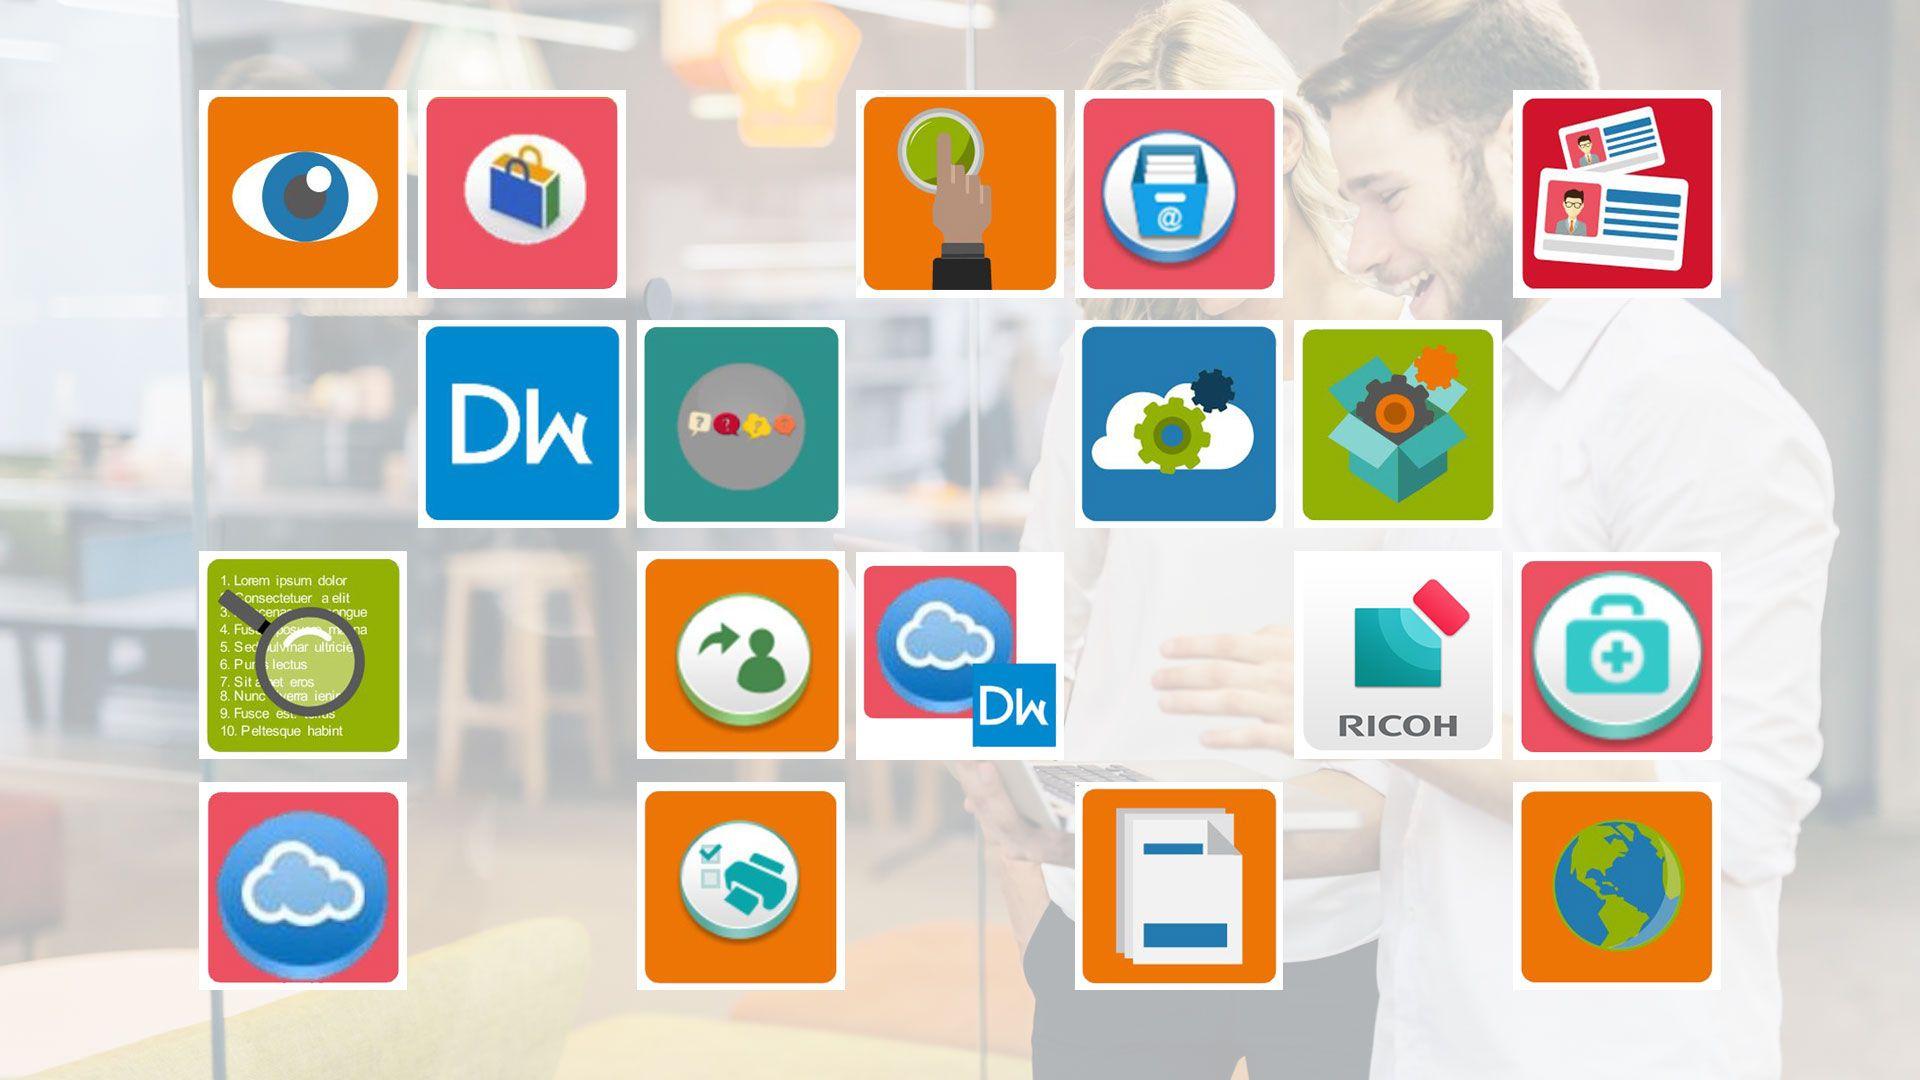 ricoh smart apps header - Ricoh Smart Apps